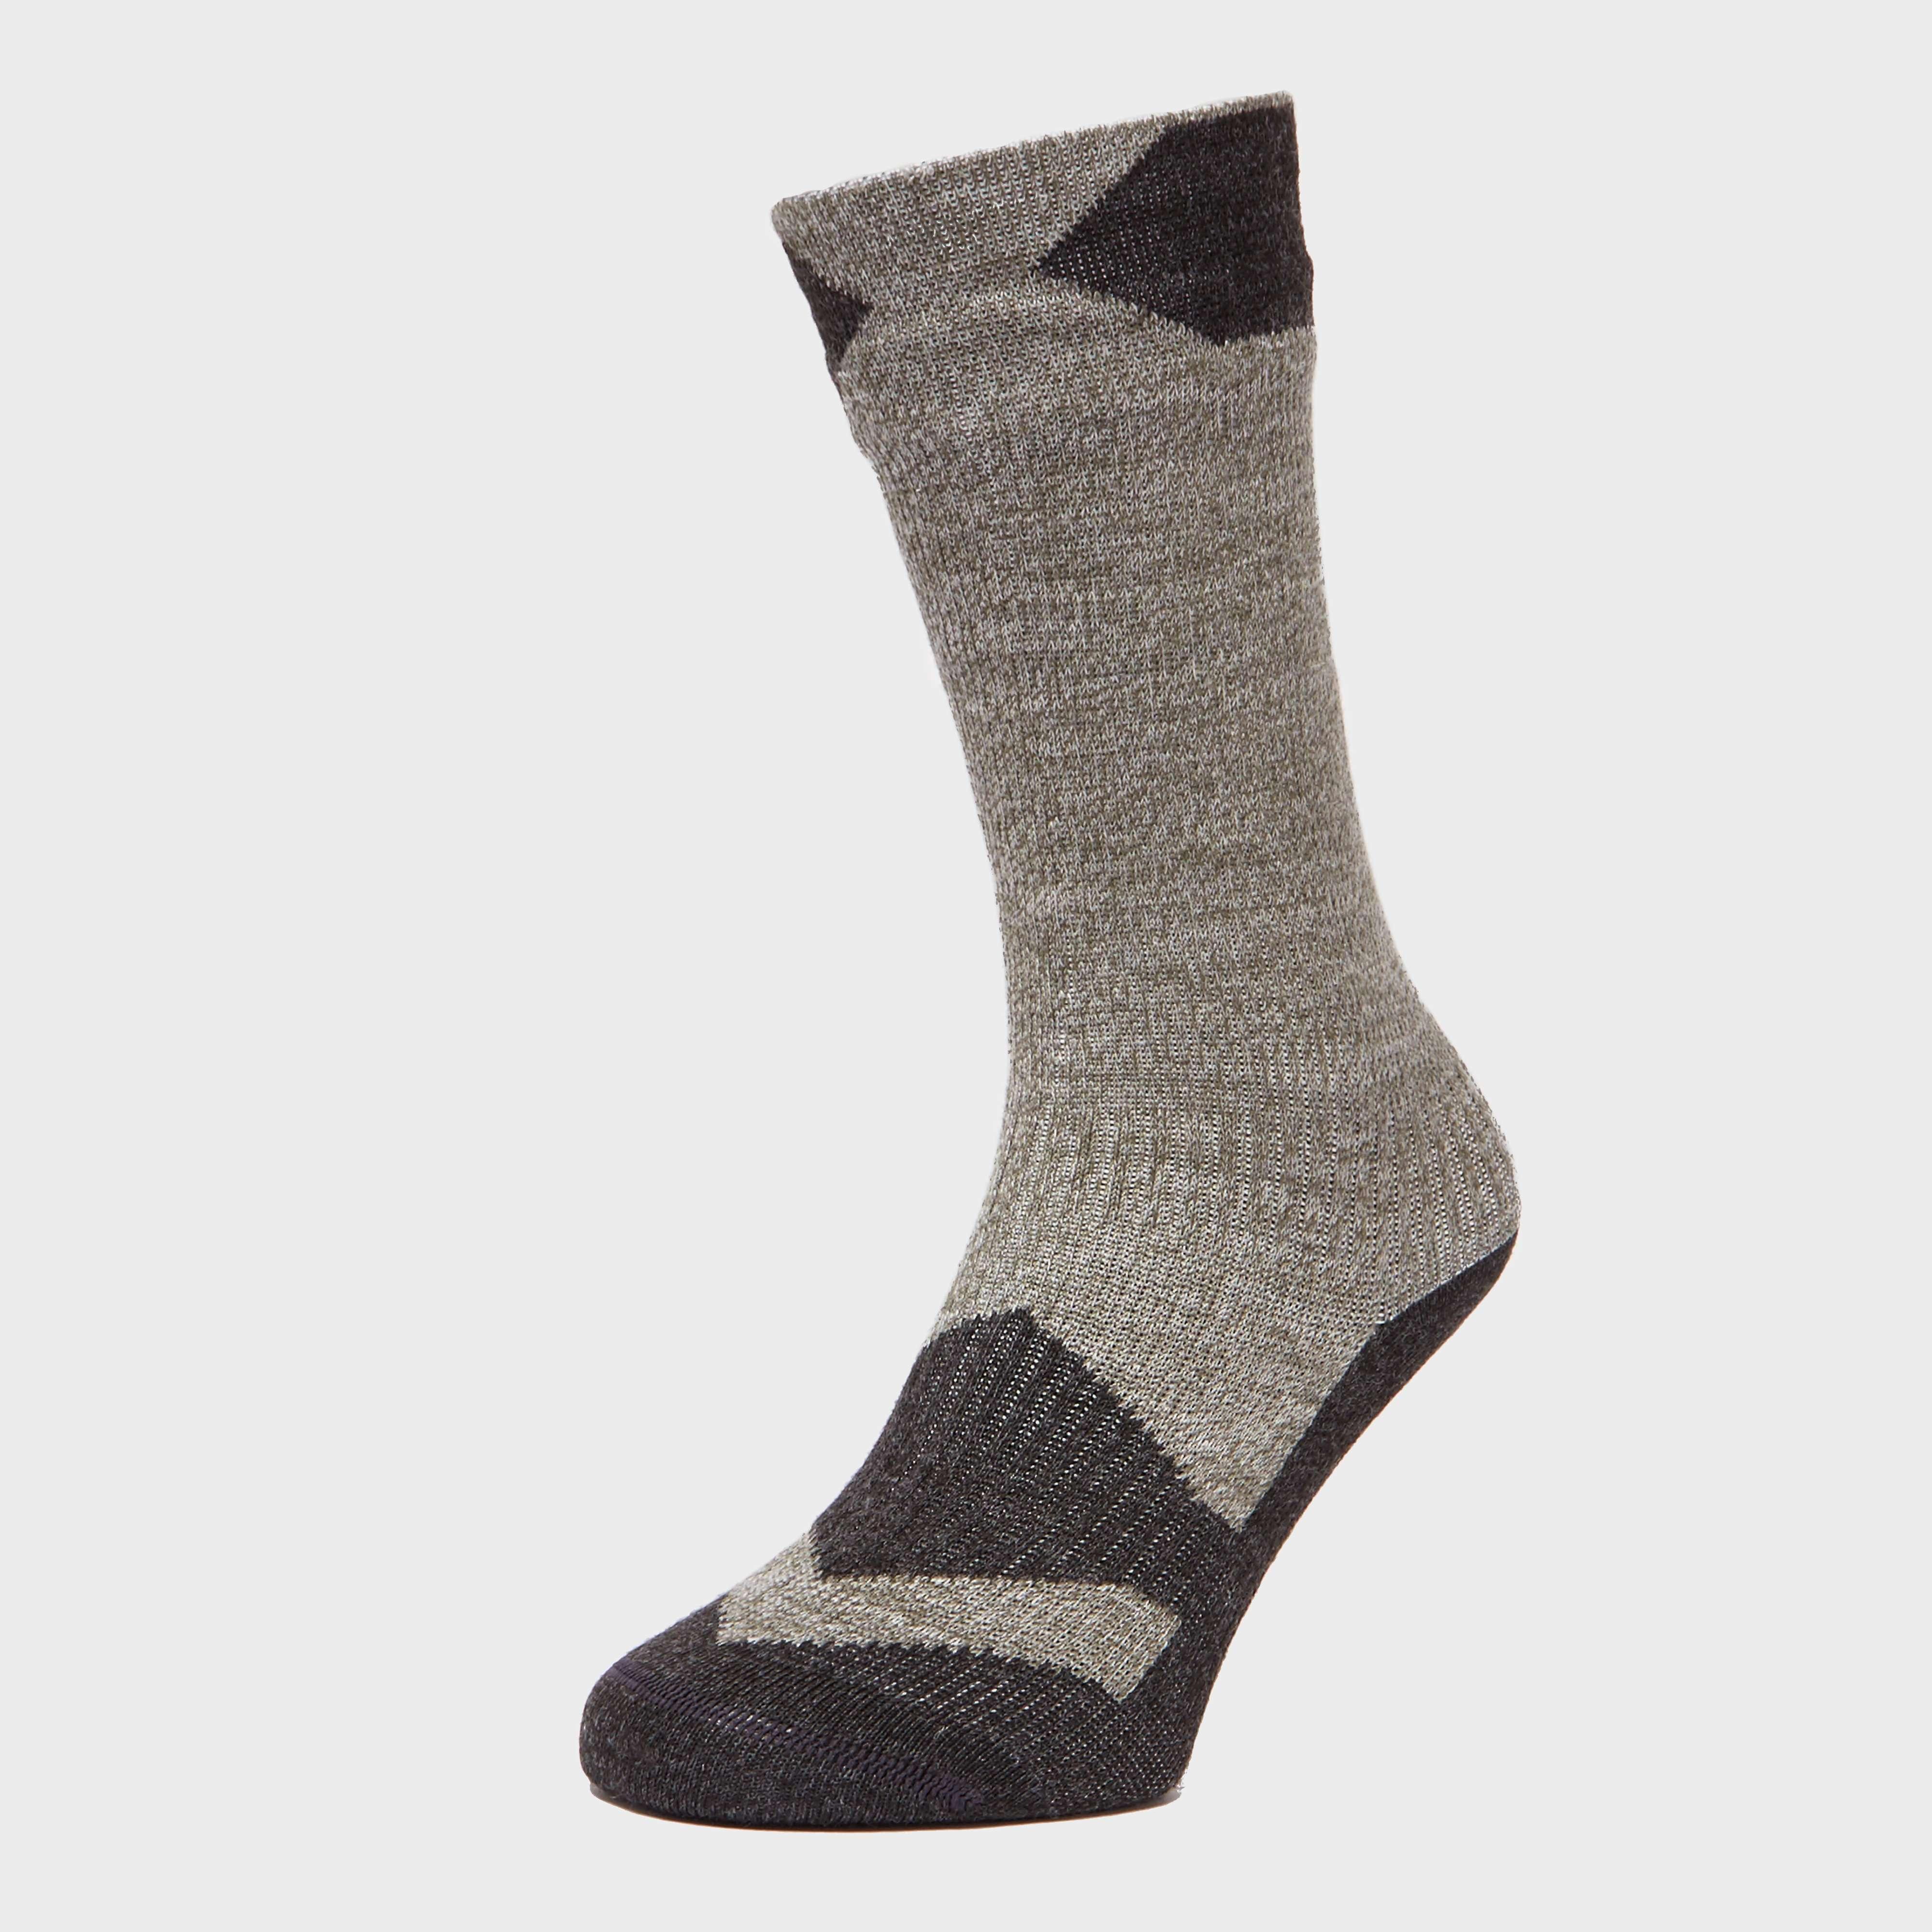 SEALSKINZ Mid Length Walking Socks